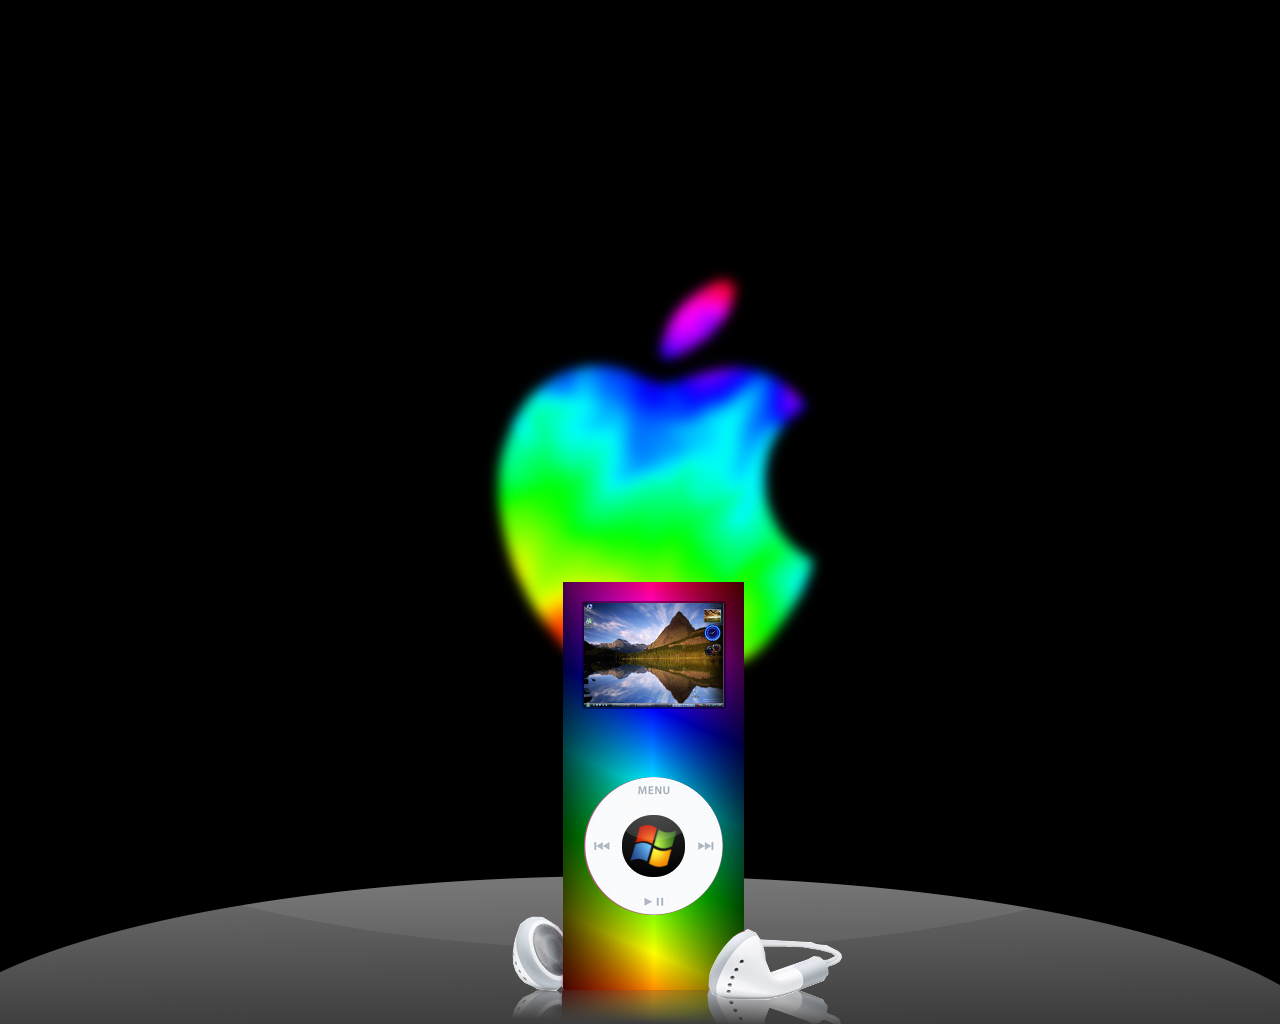 http://1.bp.blogspot.com/-IMuwDGmuIzg/T-YJpahBxYI/AAAAAAAAAIU/EiotWby4qRA/s1600/iphone+_Apple_Ipod_HD_wallpapers_background+034.png